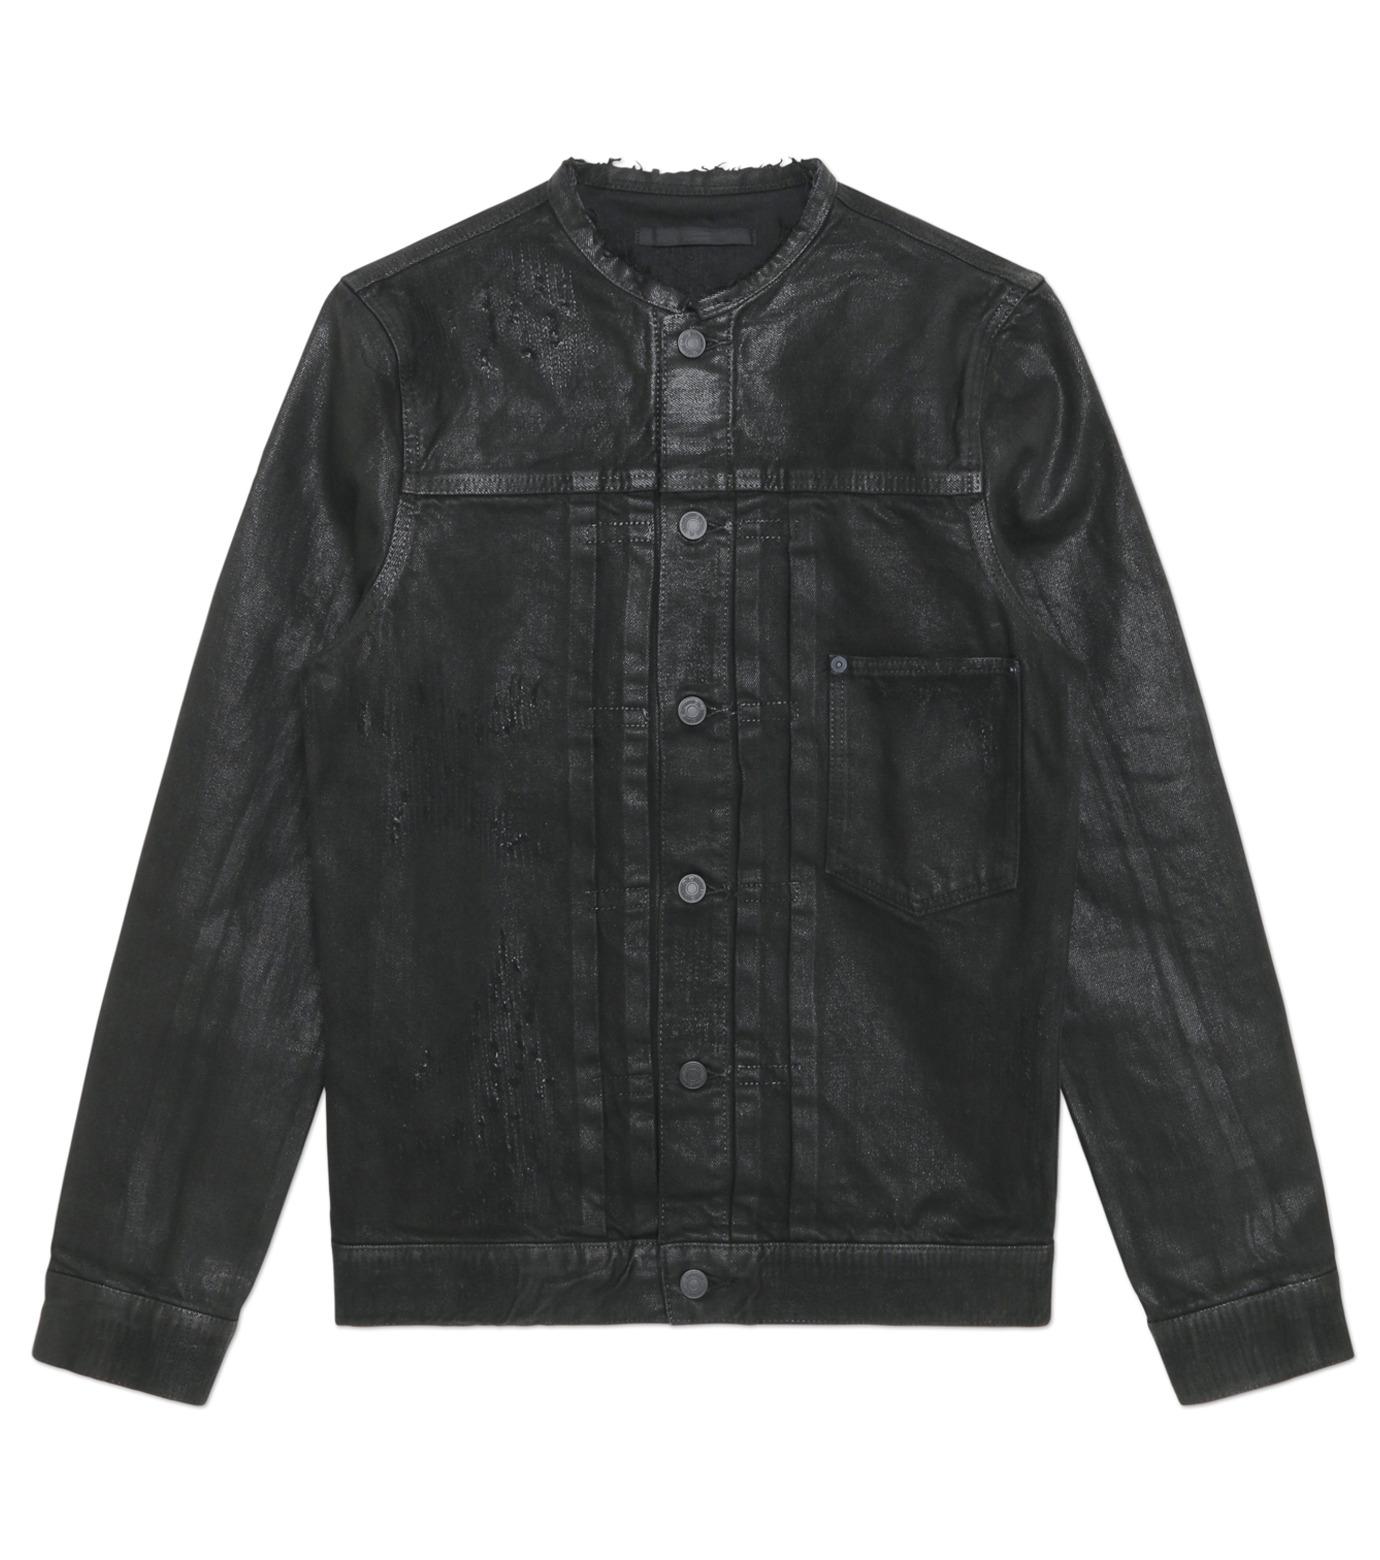 HL HEDDIE LOVU(エイチエル・エディールーヴ)のCOLLARLESS DENIM JACKET-BLACK(ジャケット/jacket)-18S94007-13 拡大詳細画像3